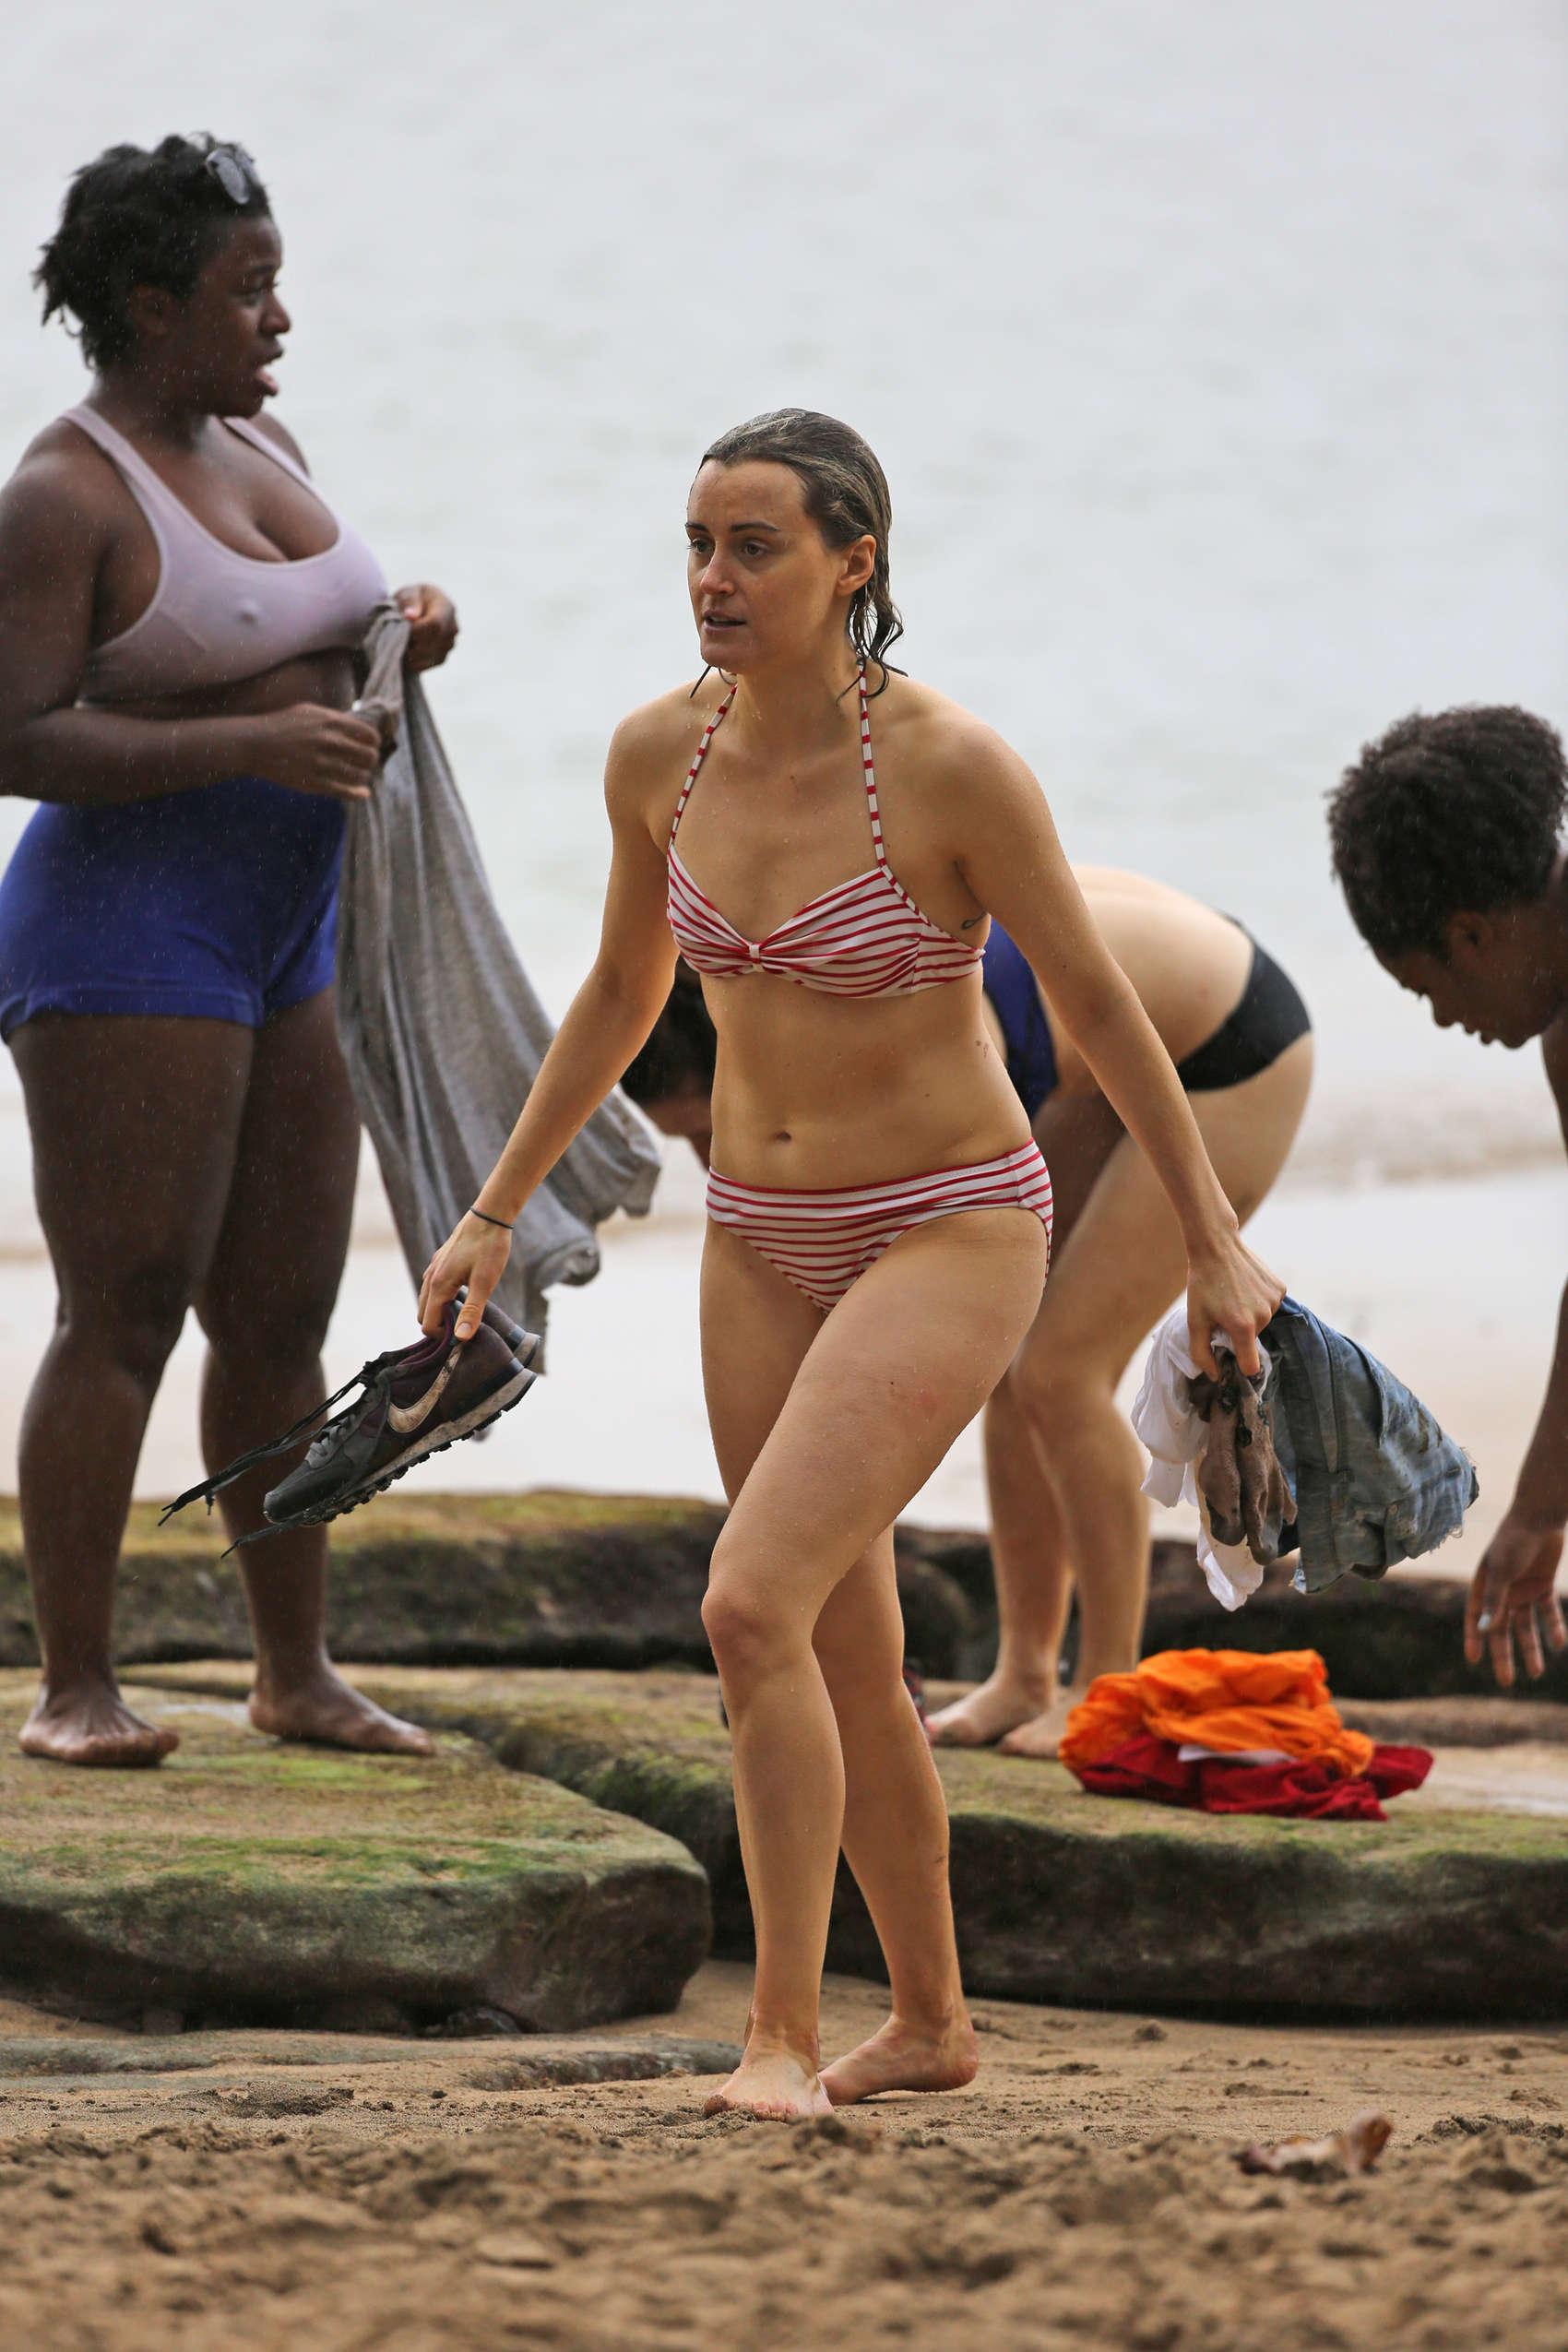 Taylor Schilling Wearing a bikini in Hawaii